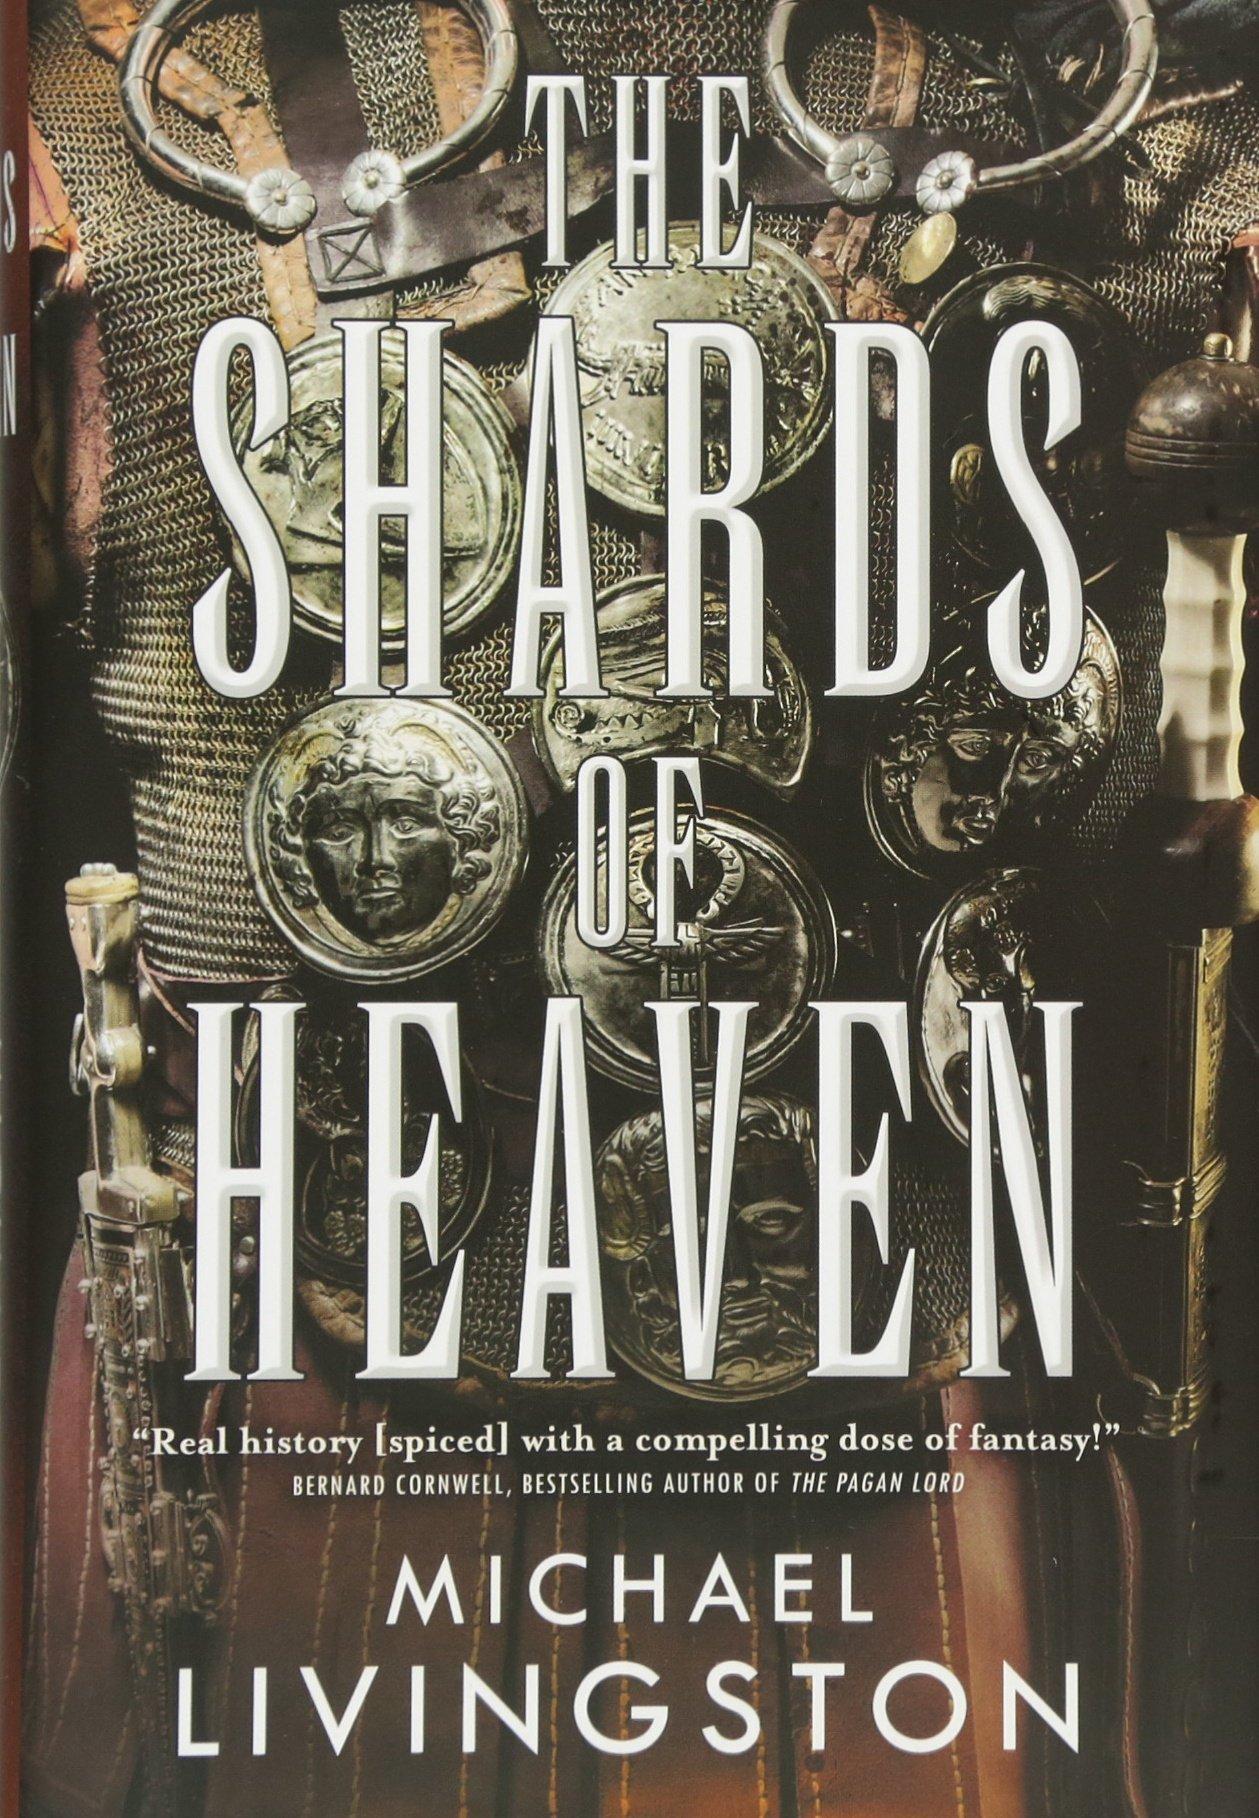 Amazon: The Shards Of Heaven (9780765380319): Michael Livingston: Books